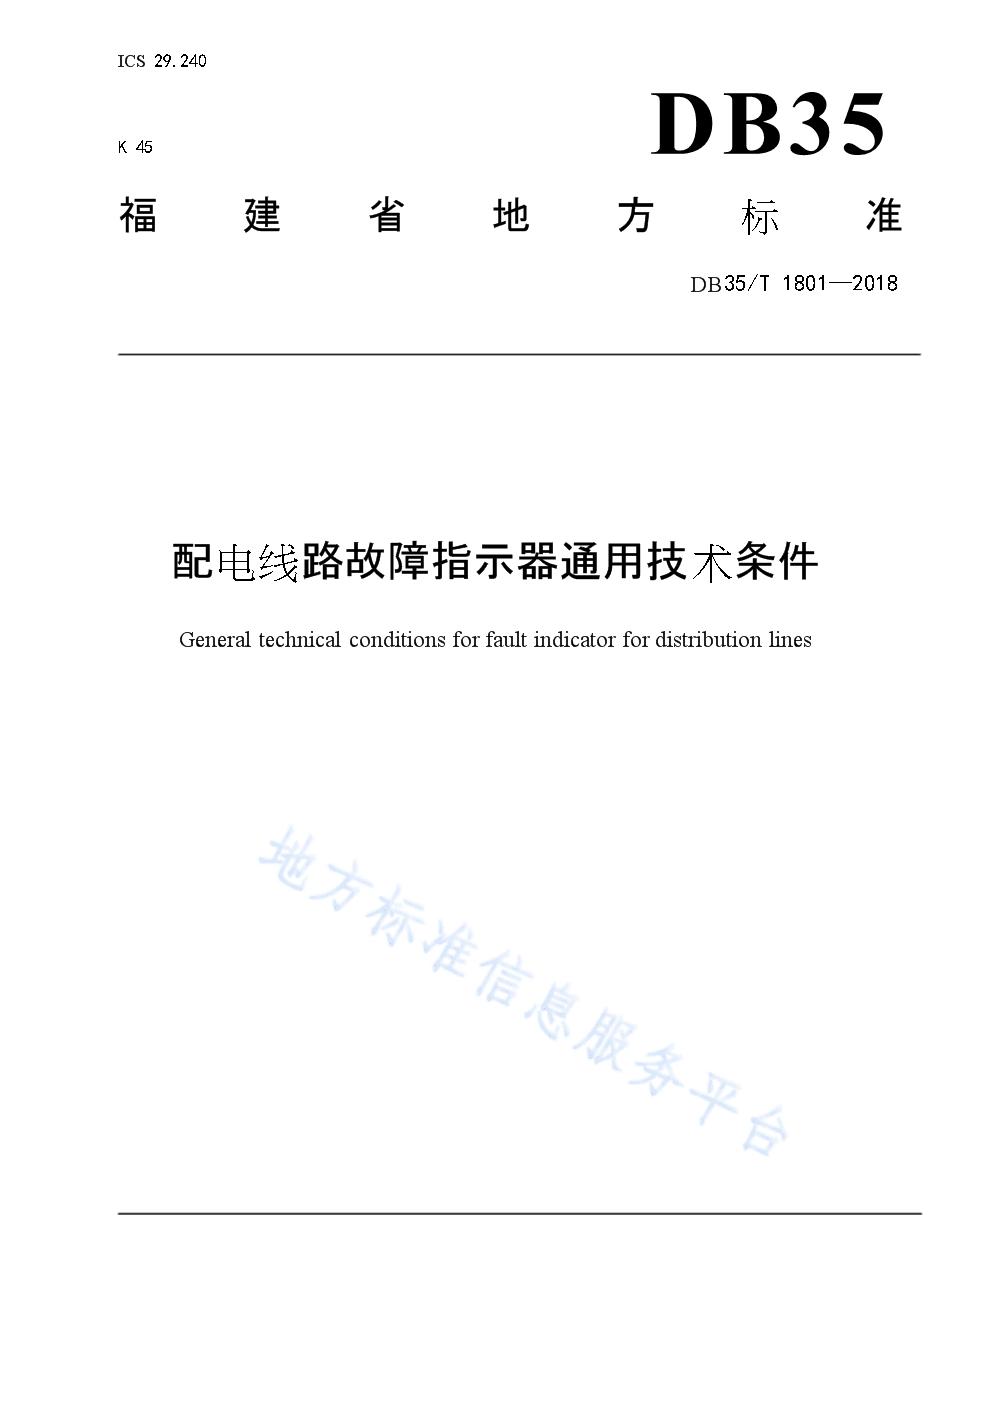 DB35_T 1801-2018配电线路故障指示器通用技术条件.docx